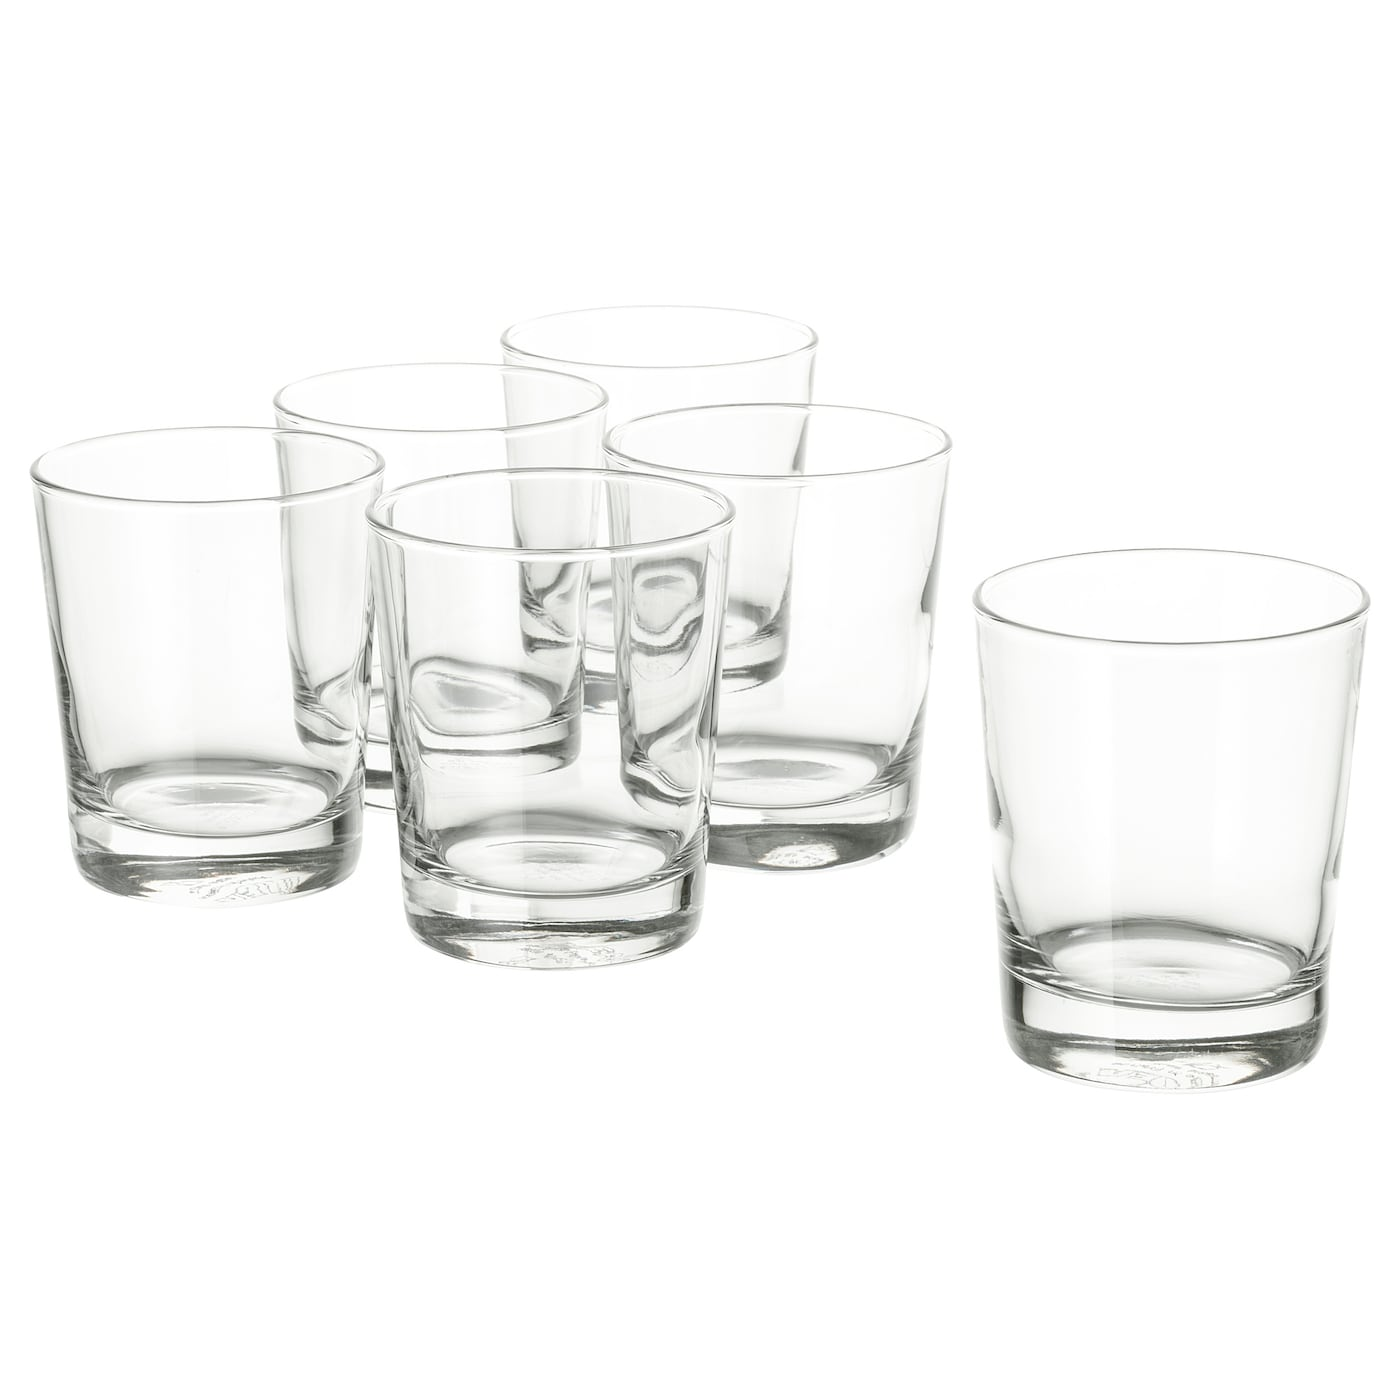 clear glass H: 4 GODIS Glass X6 IKEA